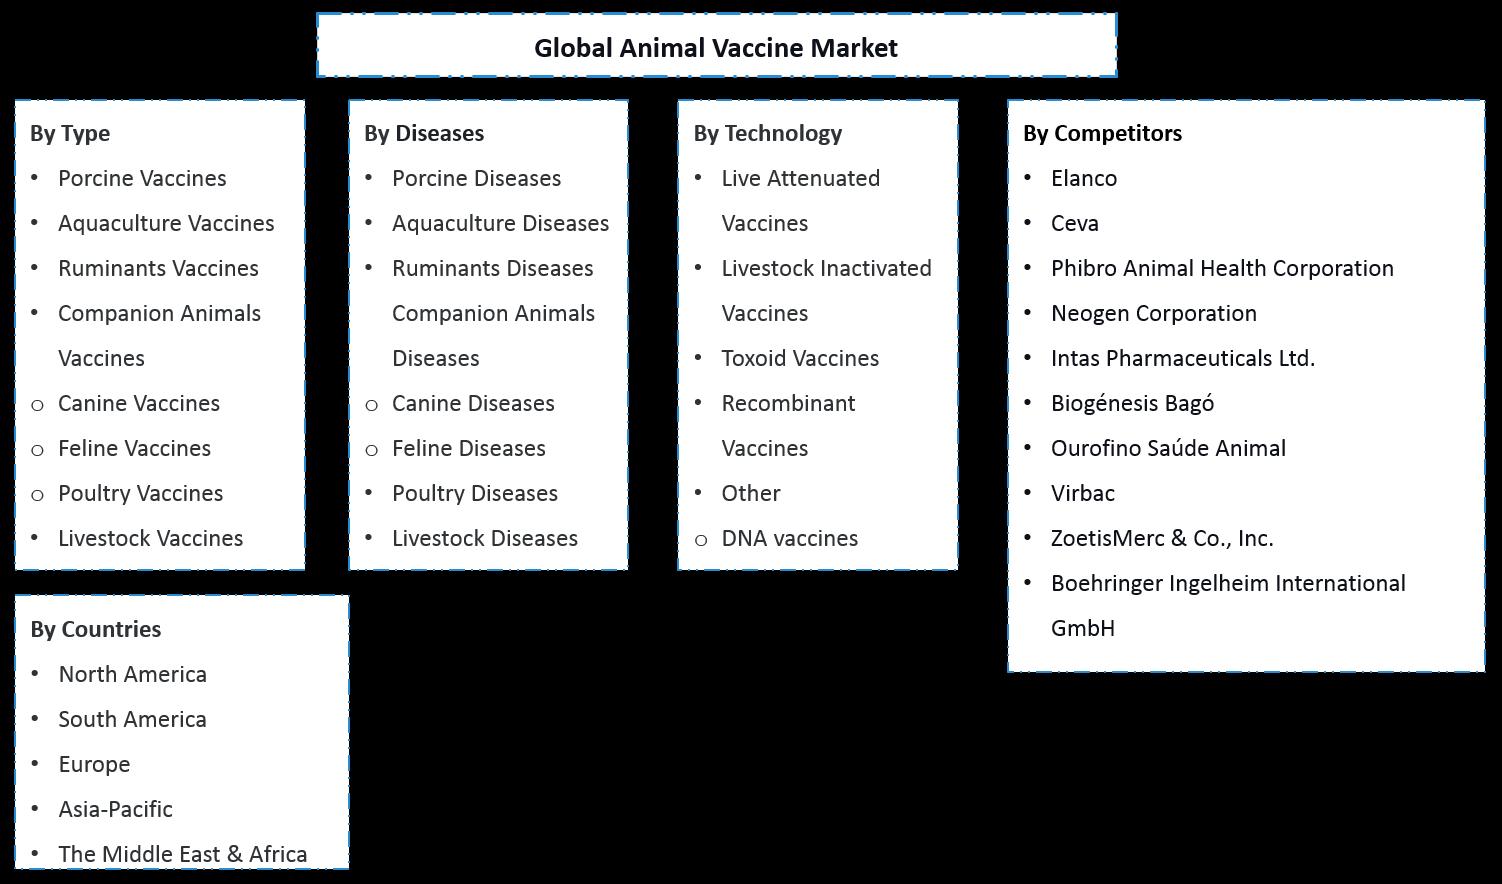 Global Animal Vaccine Market Segmentation